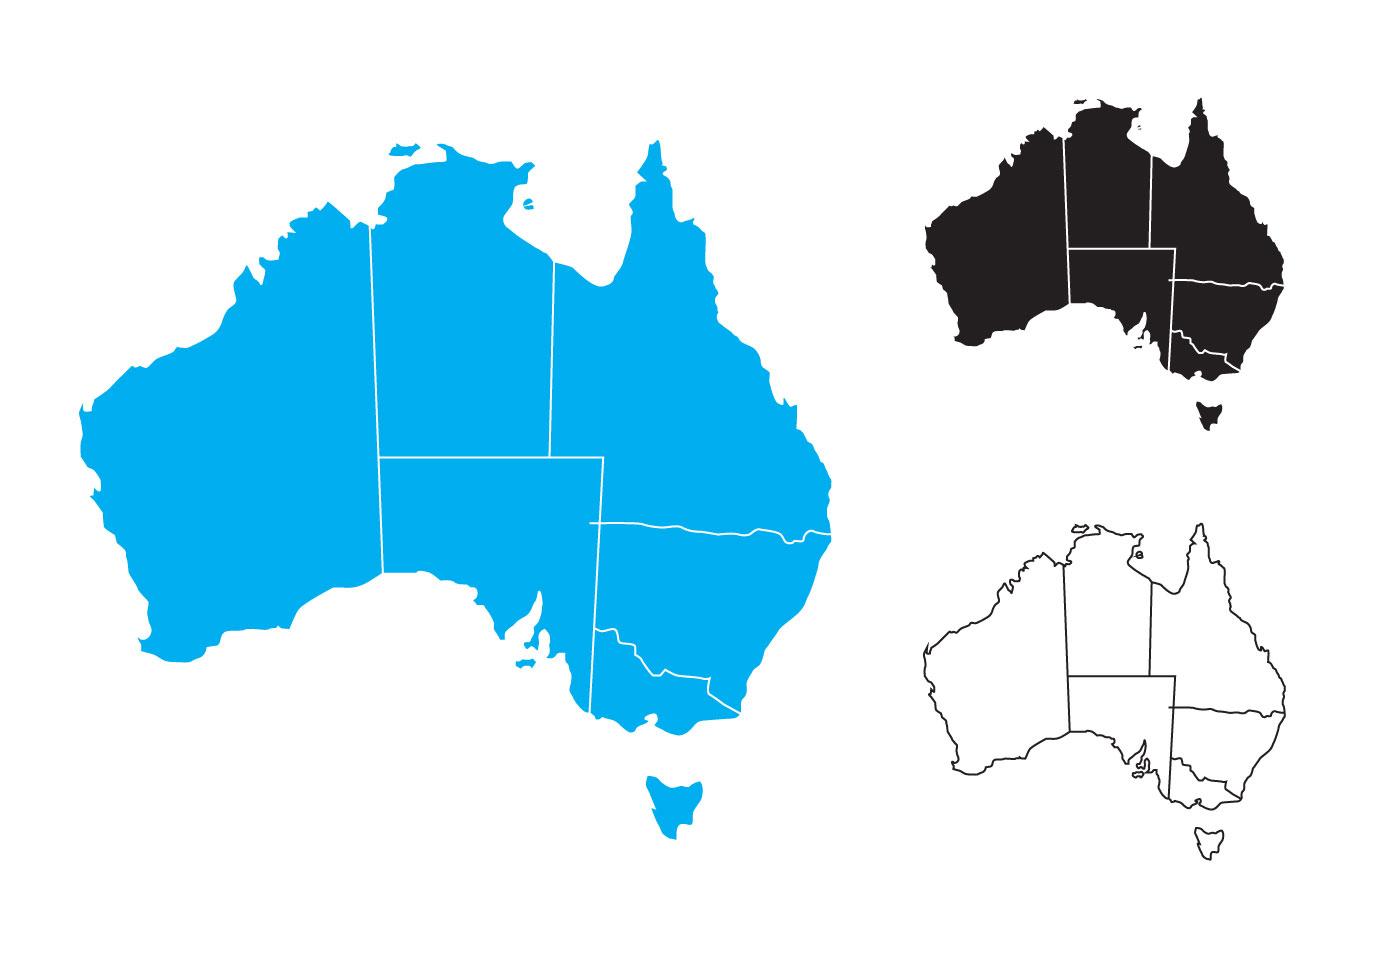 Australia Map Free Vector Art - (3154 Free Downloads)